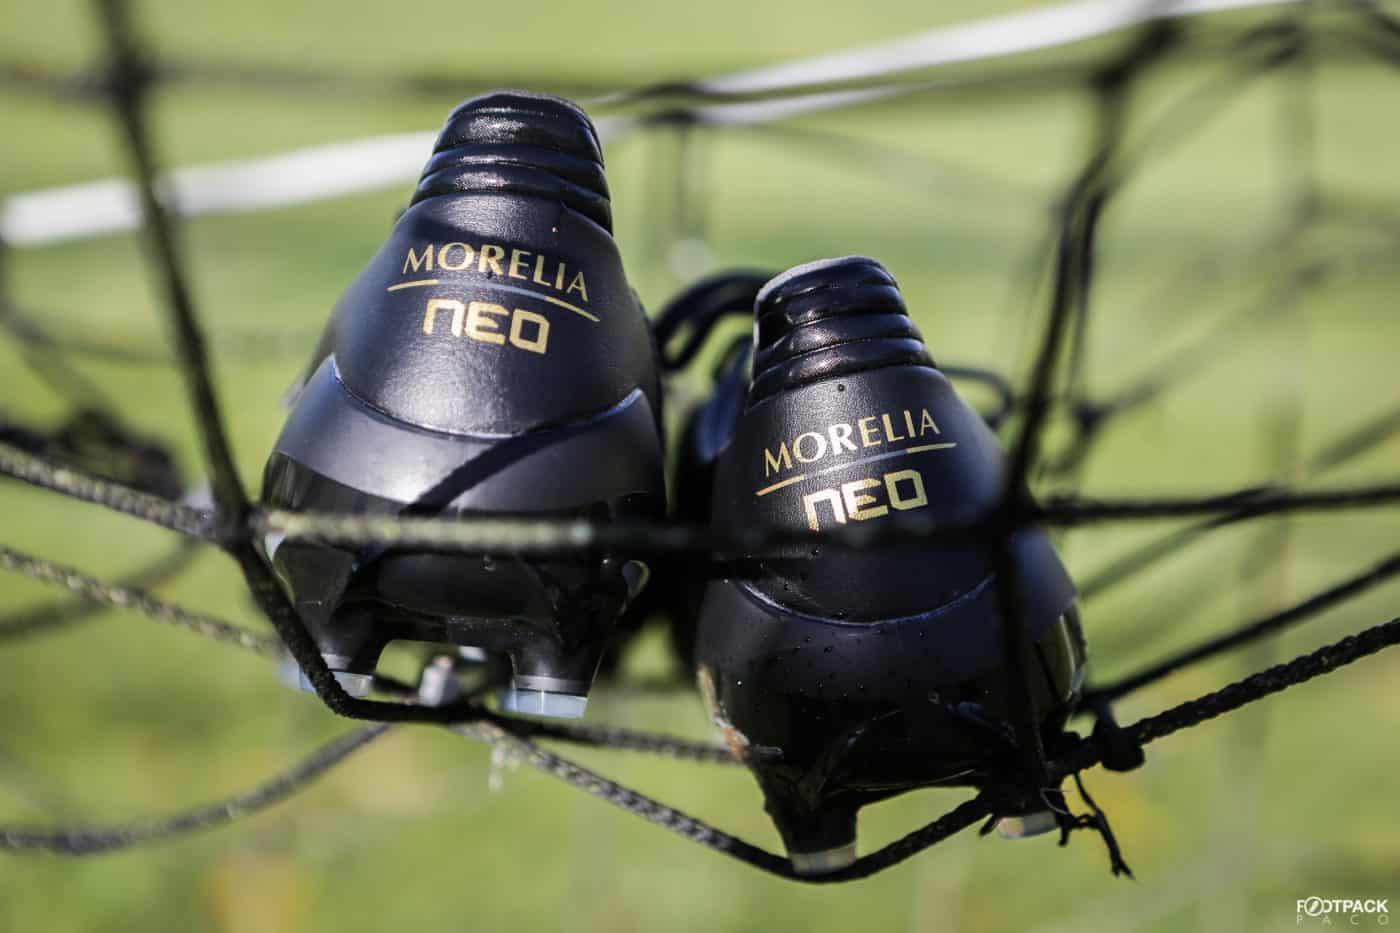 test-mizuno-morelia-2-neo-footpack-1